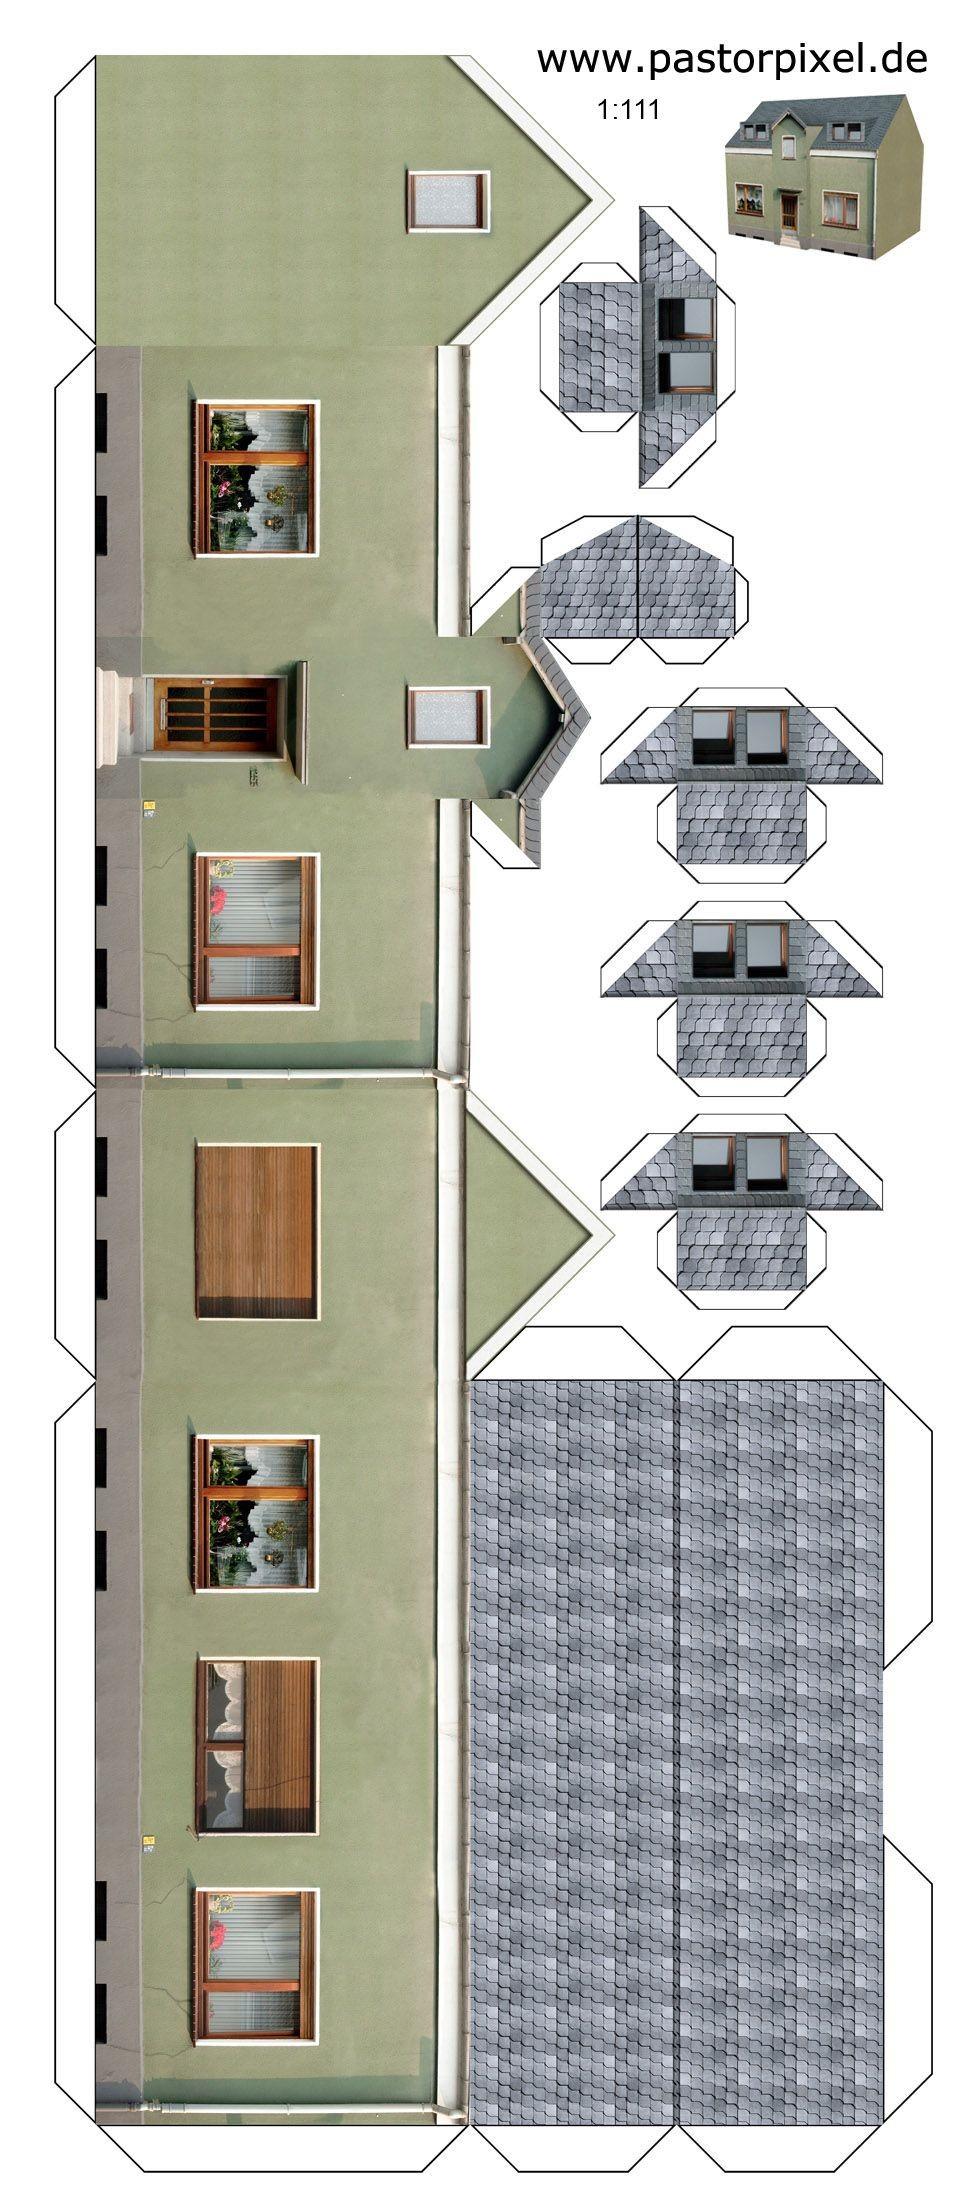 Papercraft Building Ausschneidebogen Haus 1 Printables Houses